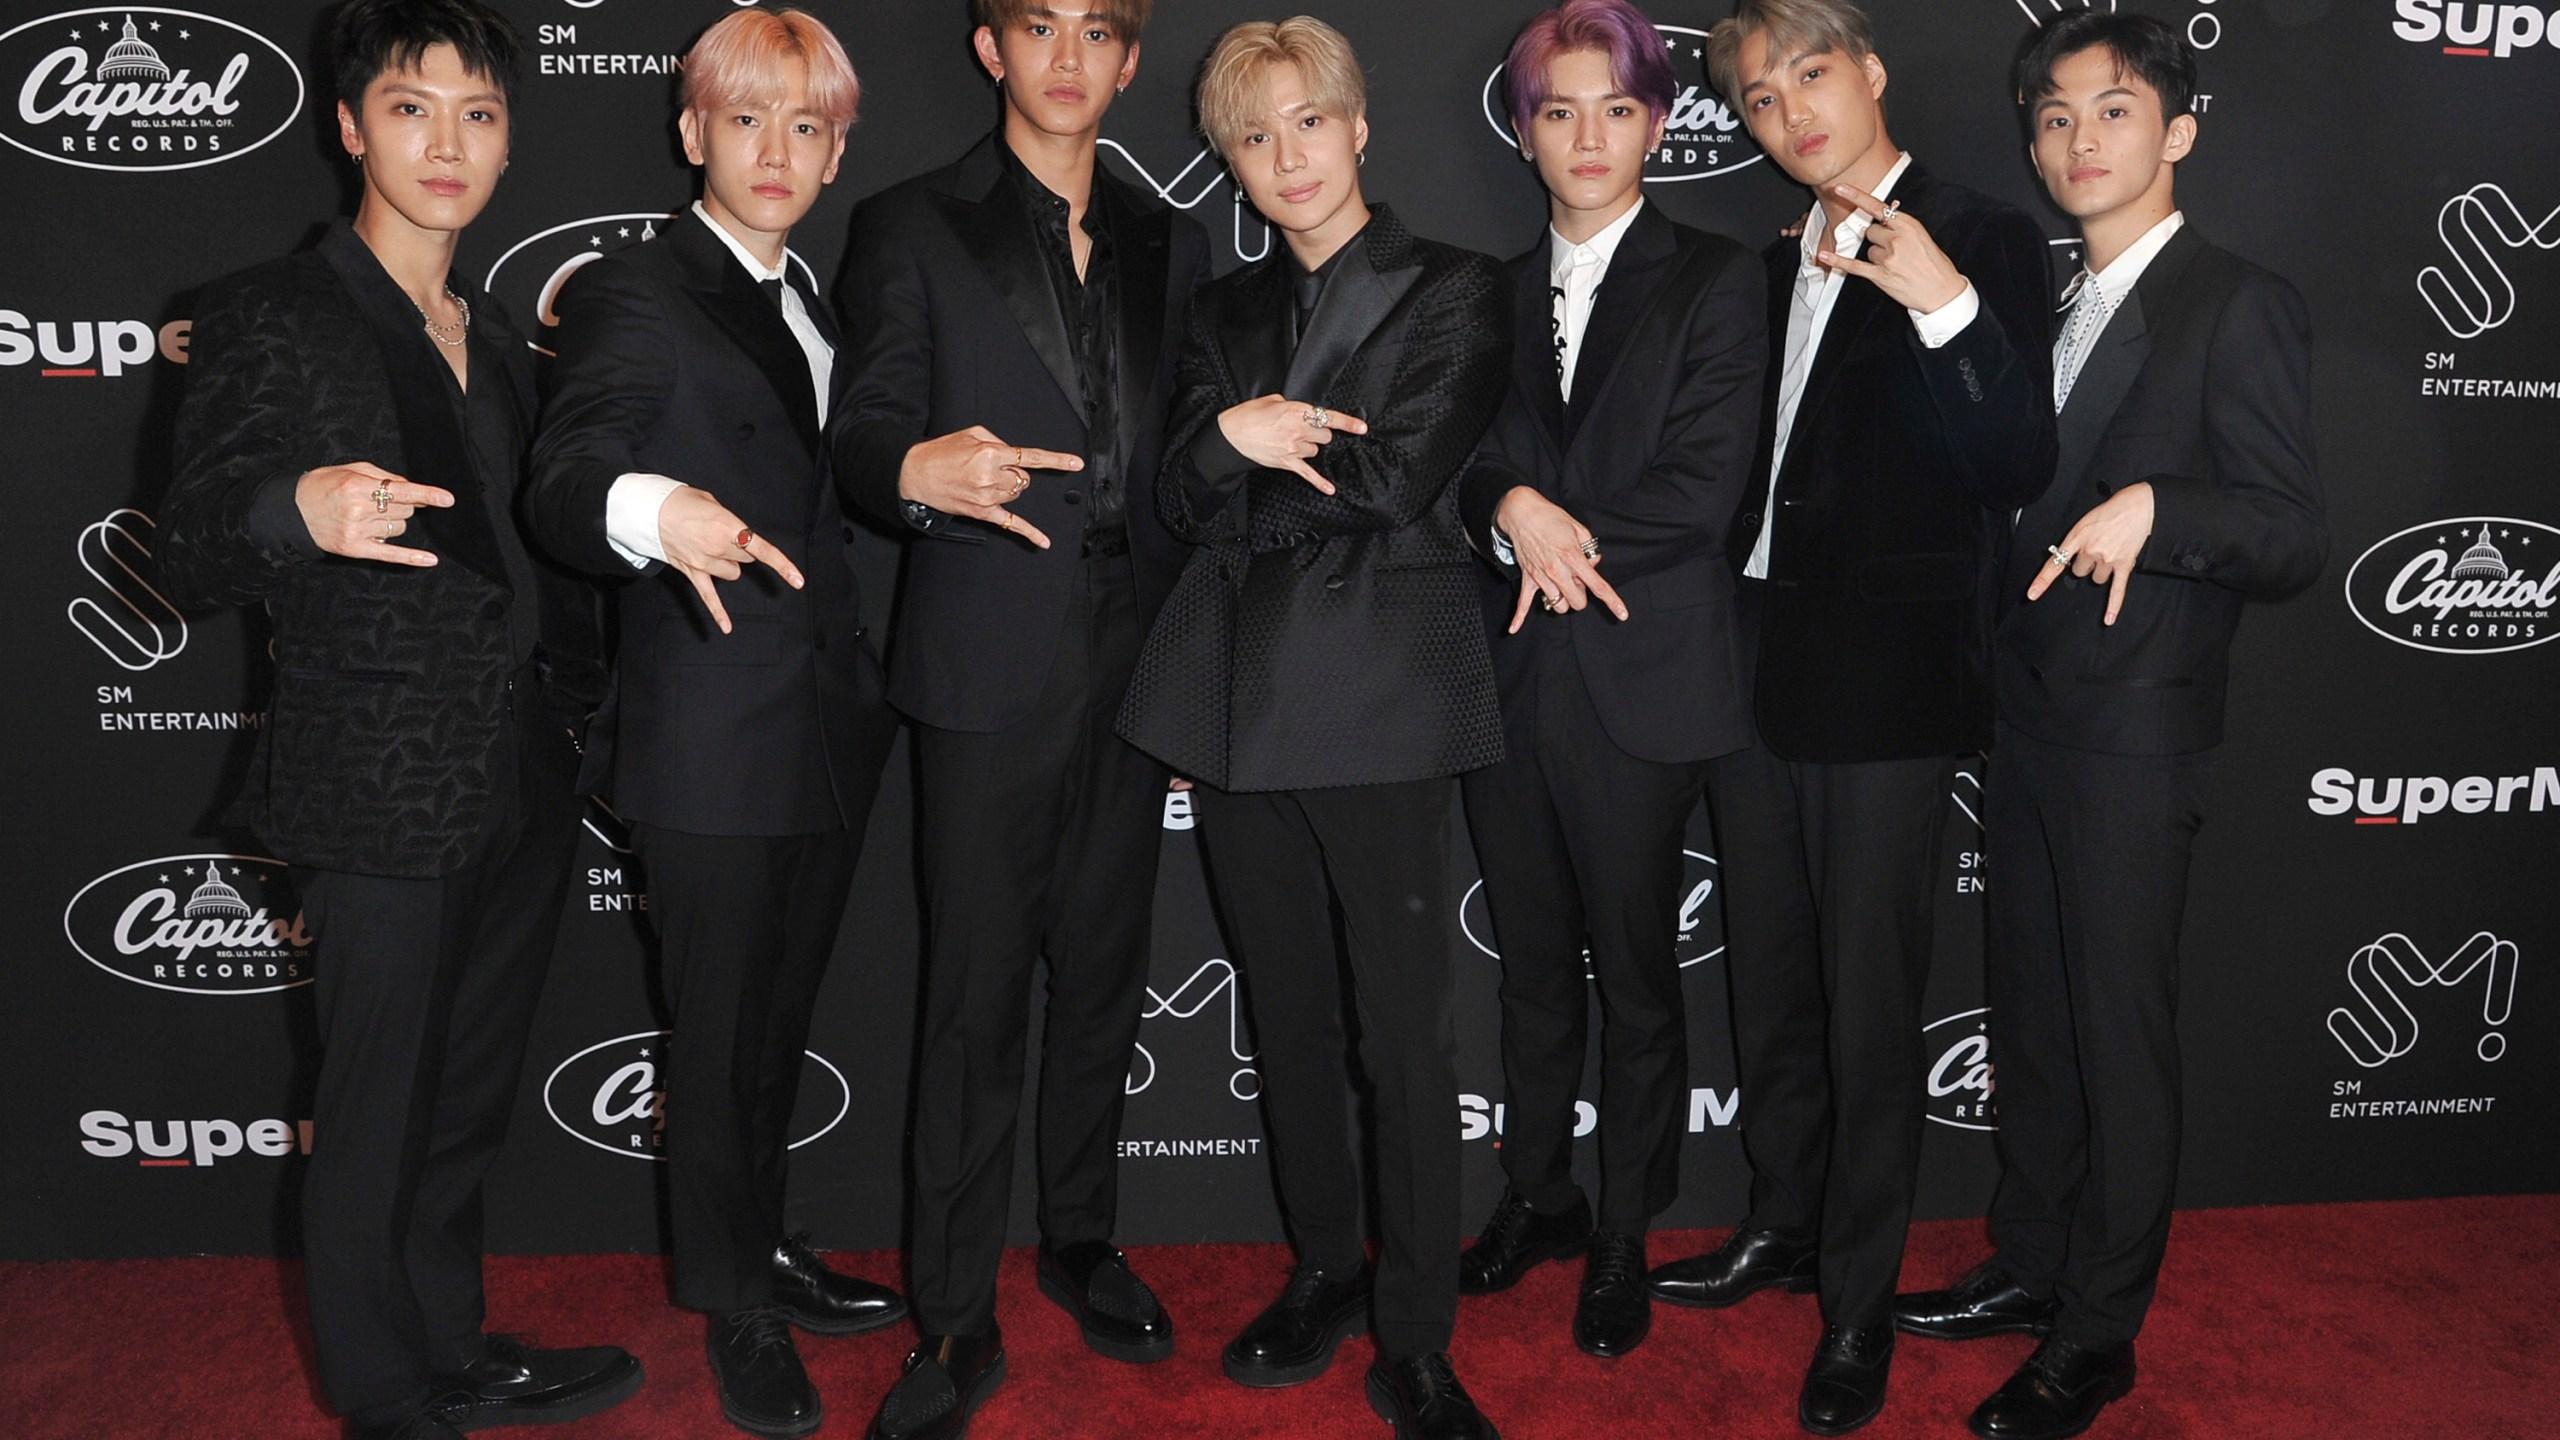 Ten, Baekhyun, Lucas, Taemin, Taeyong, Kai, Mark